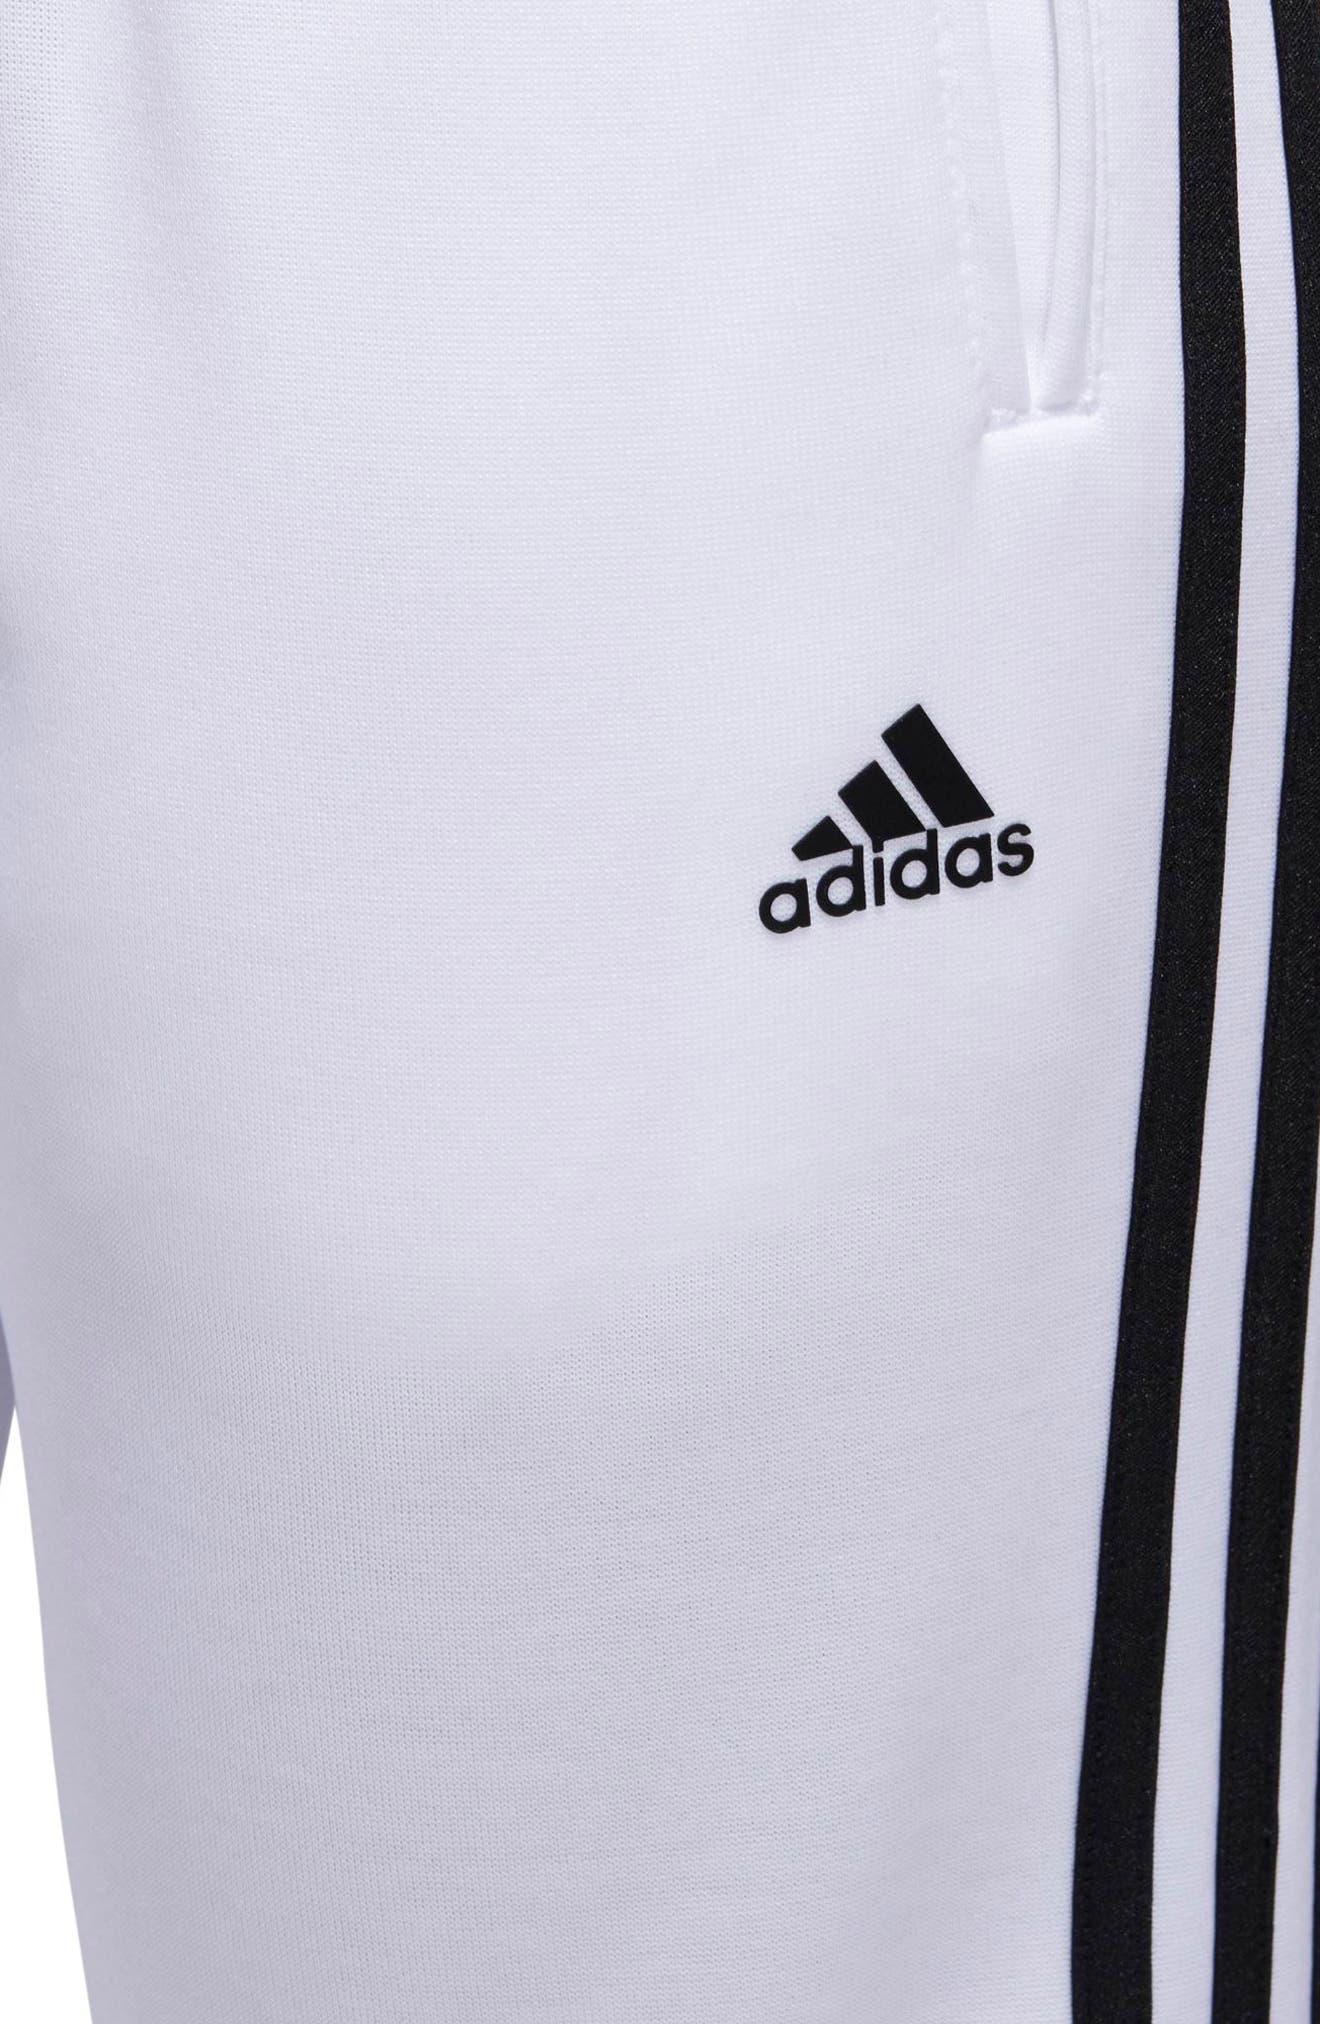 Tricot Snap Pants,                             Alternate thumbnail 9, color,                             WHITE/ BLACK/ BLACK